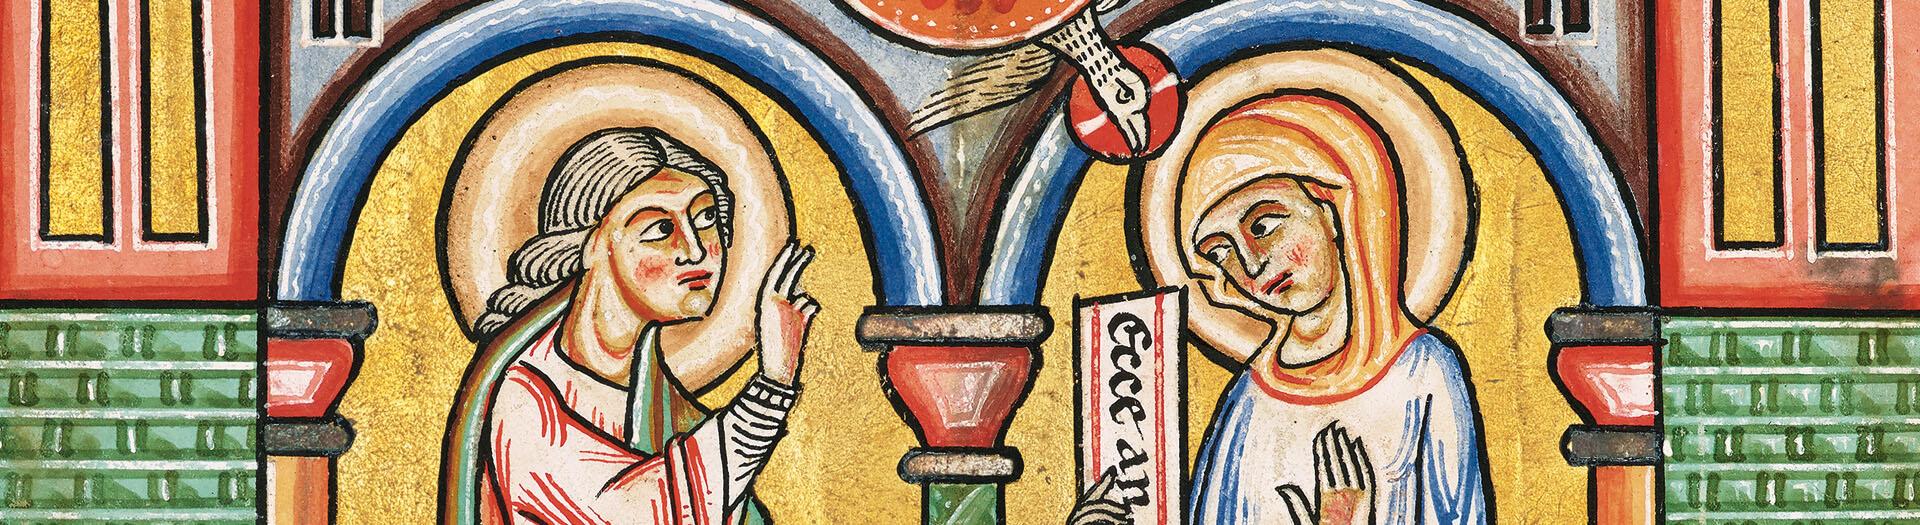 The Stammheim Missal, fol. 11v